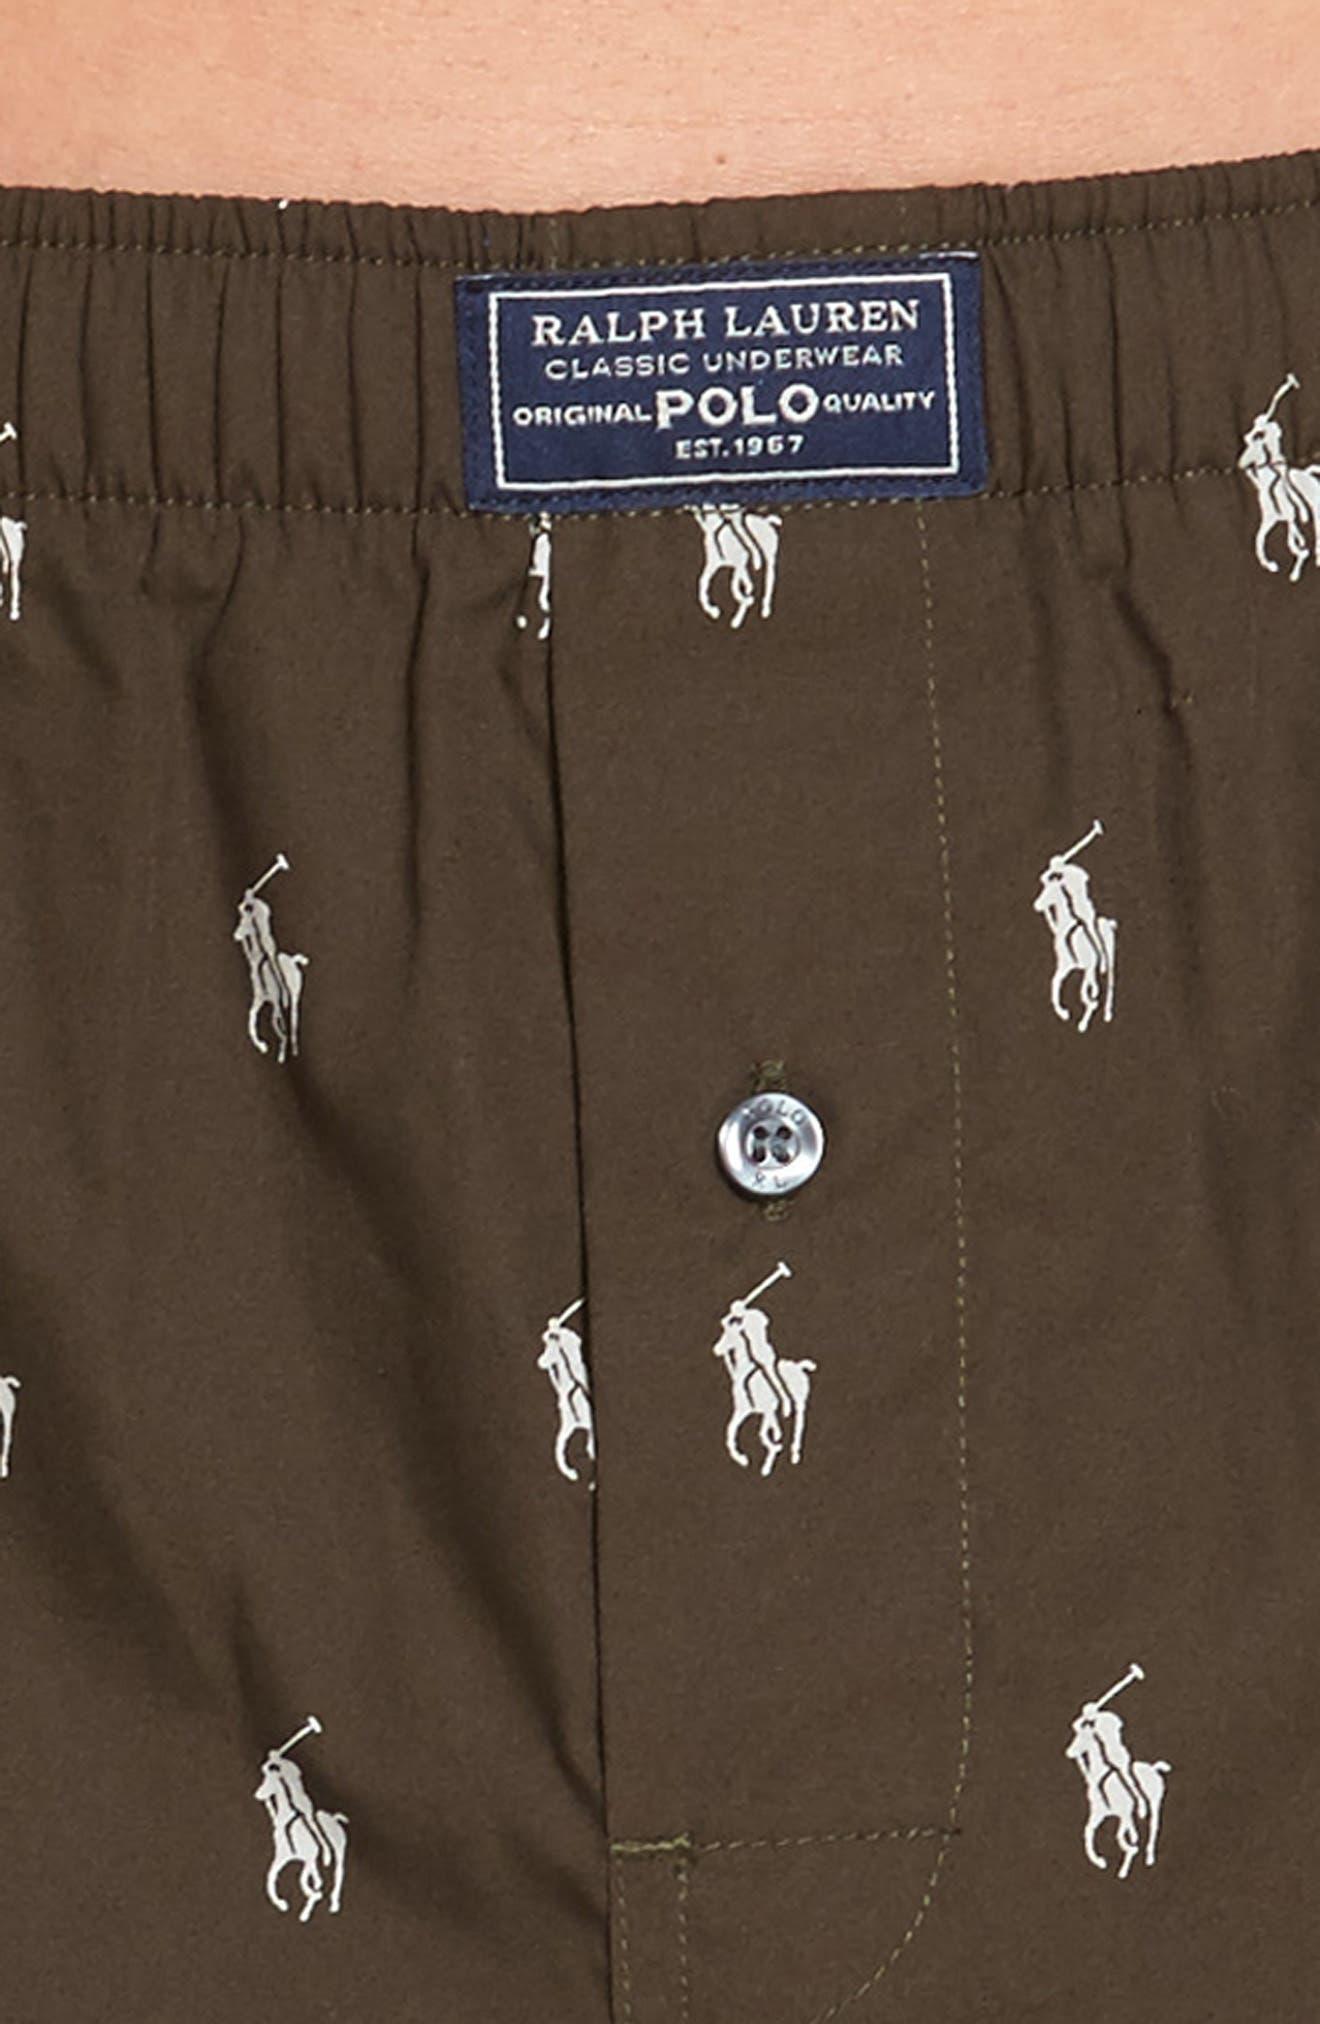 Pony Cotton Boxers,                             Alternate thumbnail 24, color,